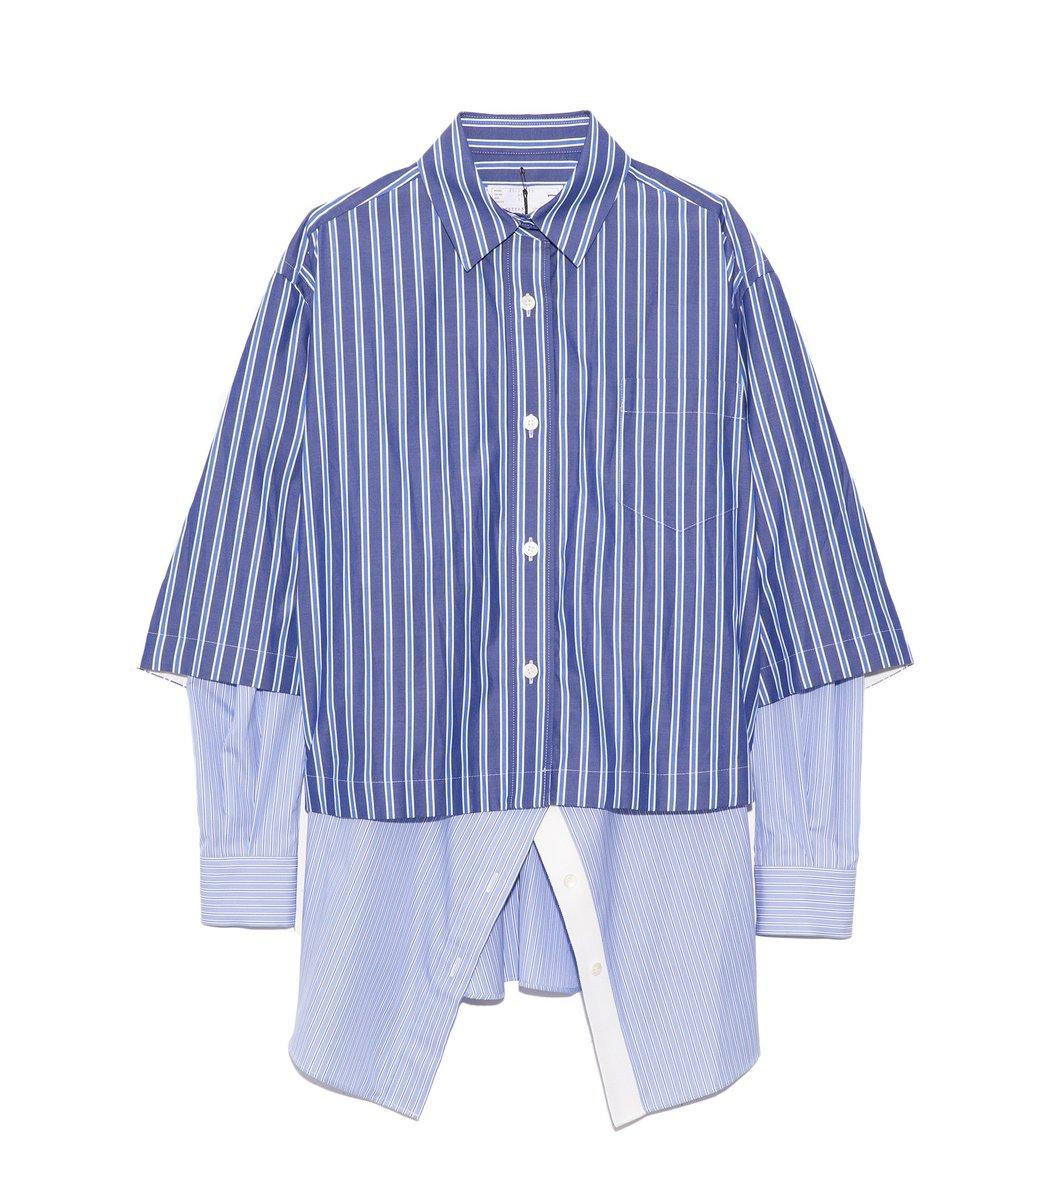 Sacai Cotton Poplin Stripe Double Shirt in Blue